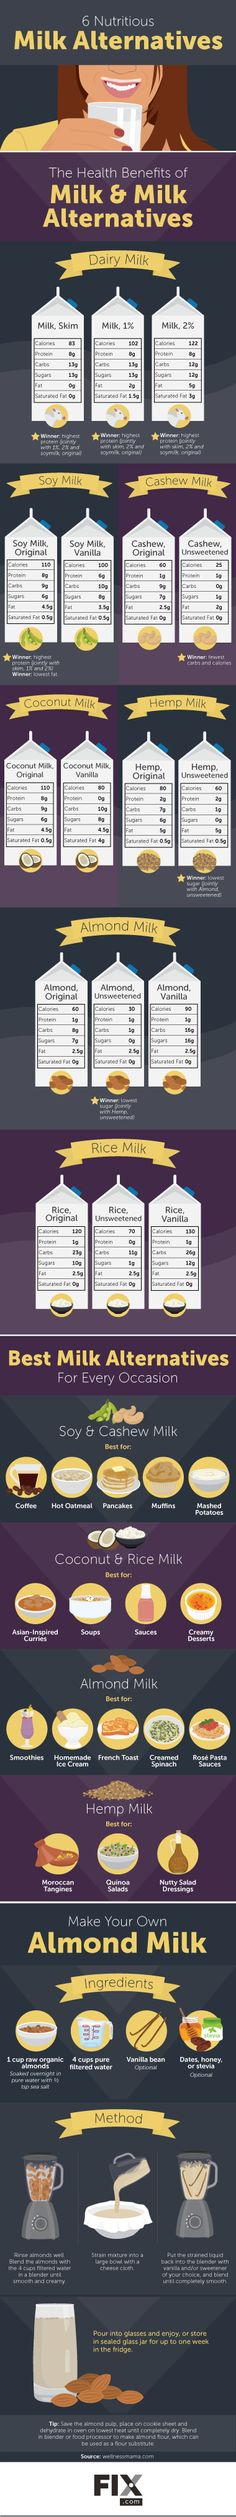 Healthy Alternatives to Dairy Milk   Fix.com